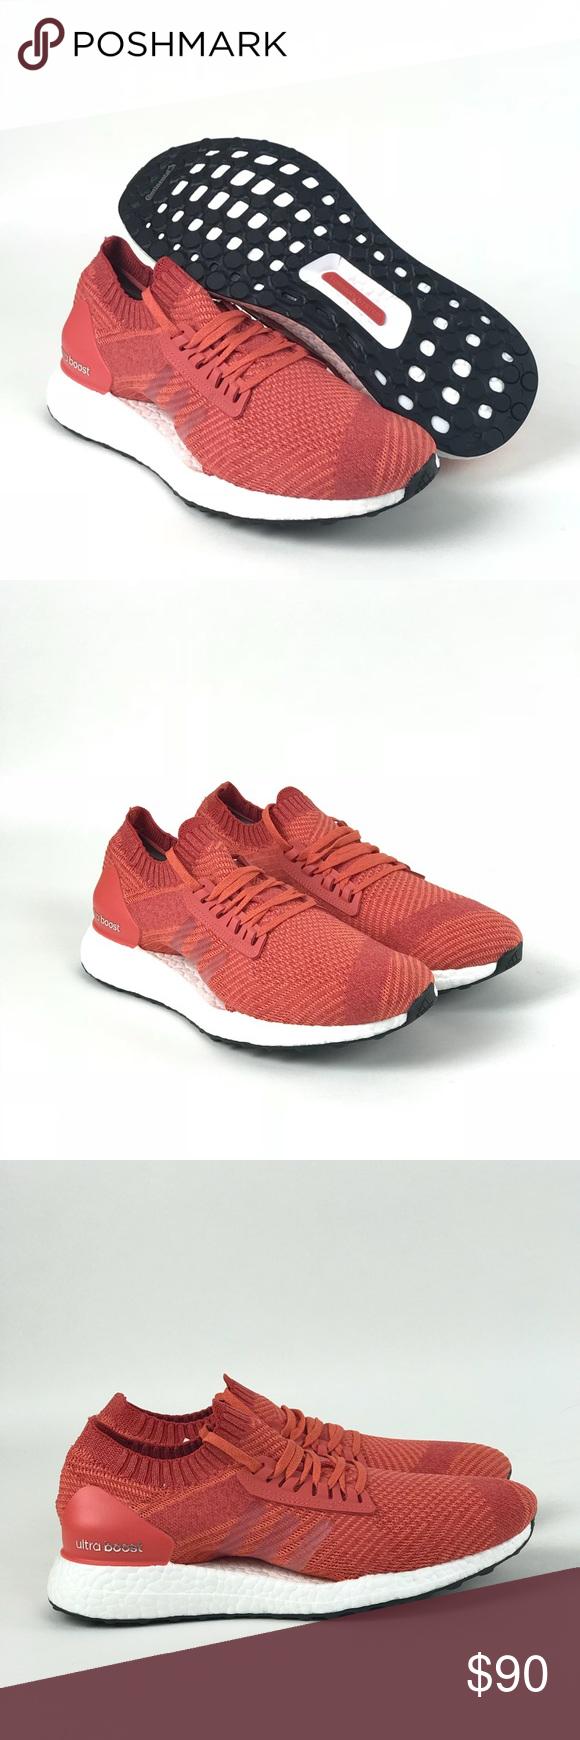 bdfa4bd628434 Adidas Womens Ultra Boost X Running Shoes Sz 10 Adidas Womens Ultra Boost X  Scarlet Red Crystal White Running Shoes BB6160 Sz 10 New without box. adidas  ...